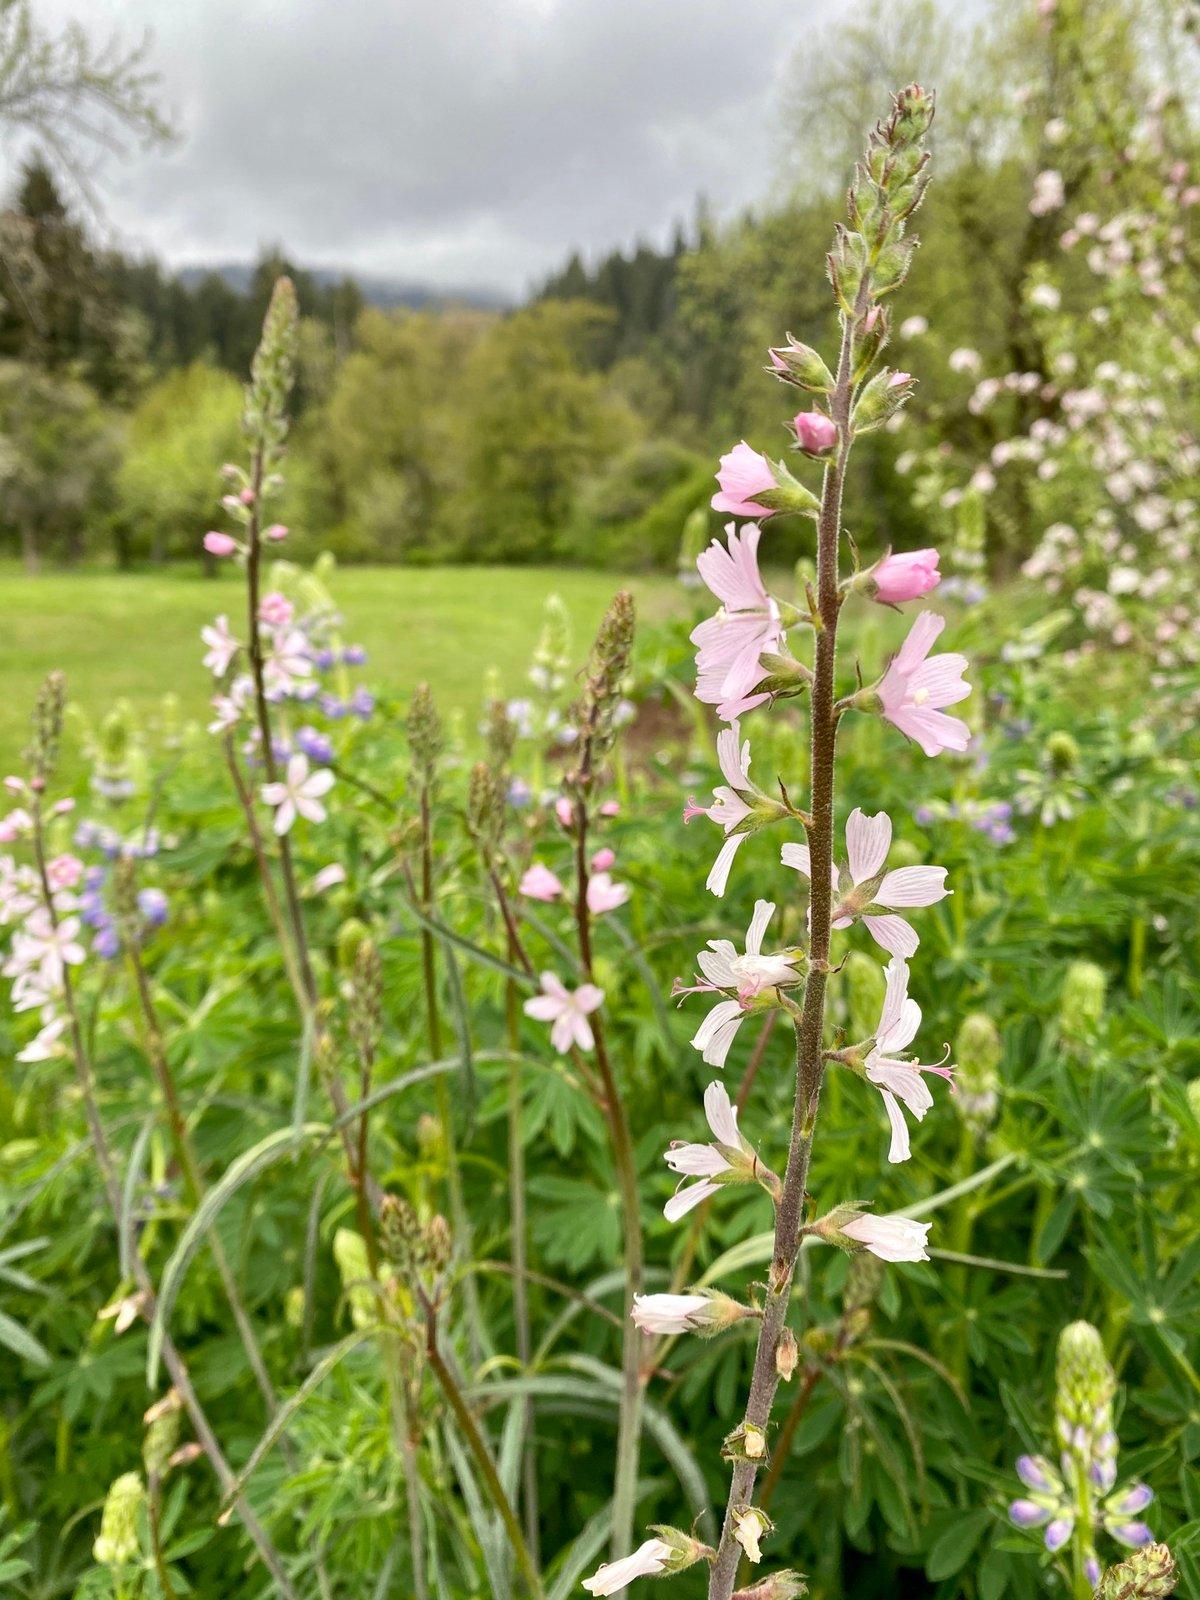 Meadow Checkermallow : Sidalcea campestris